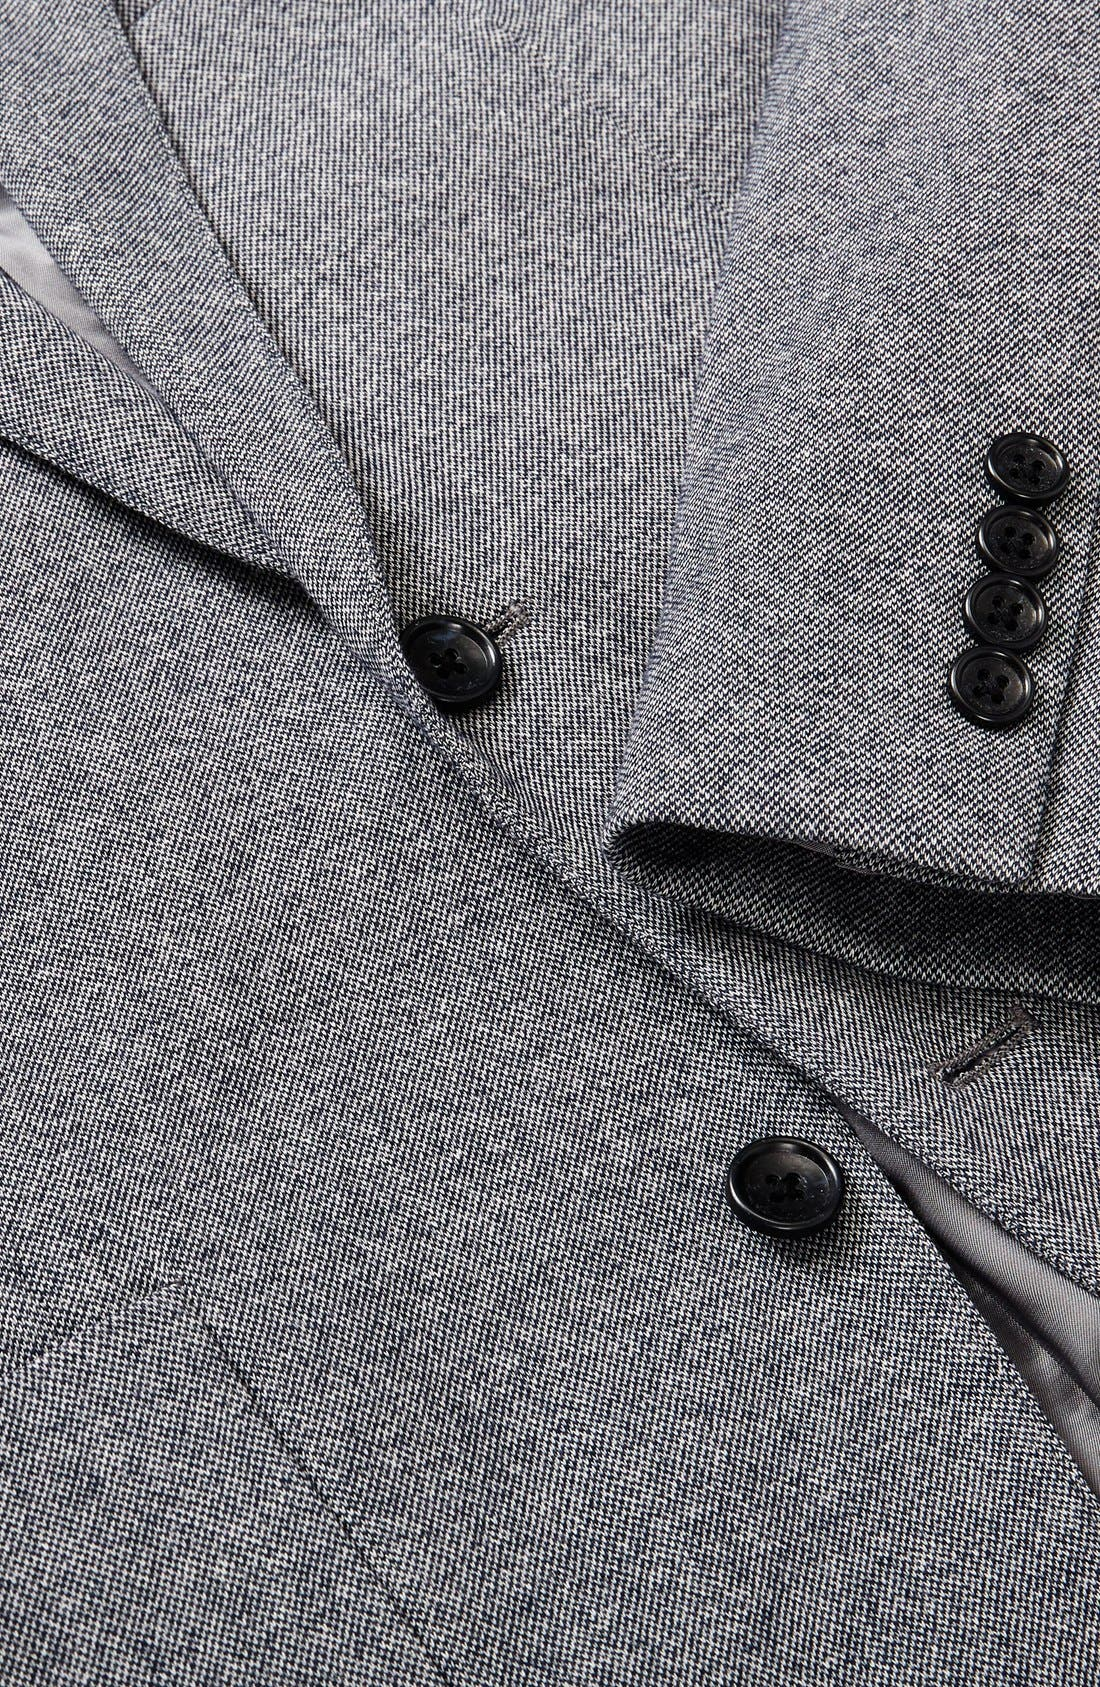 BONOBOS, Jetsetter Slim Fit Knit Cotton Sport Coat, Alternate thumbnail 8, color, LIGHT GREY